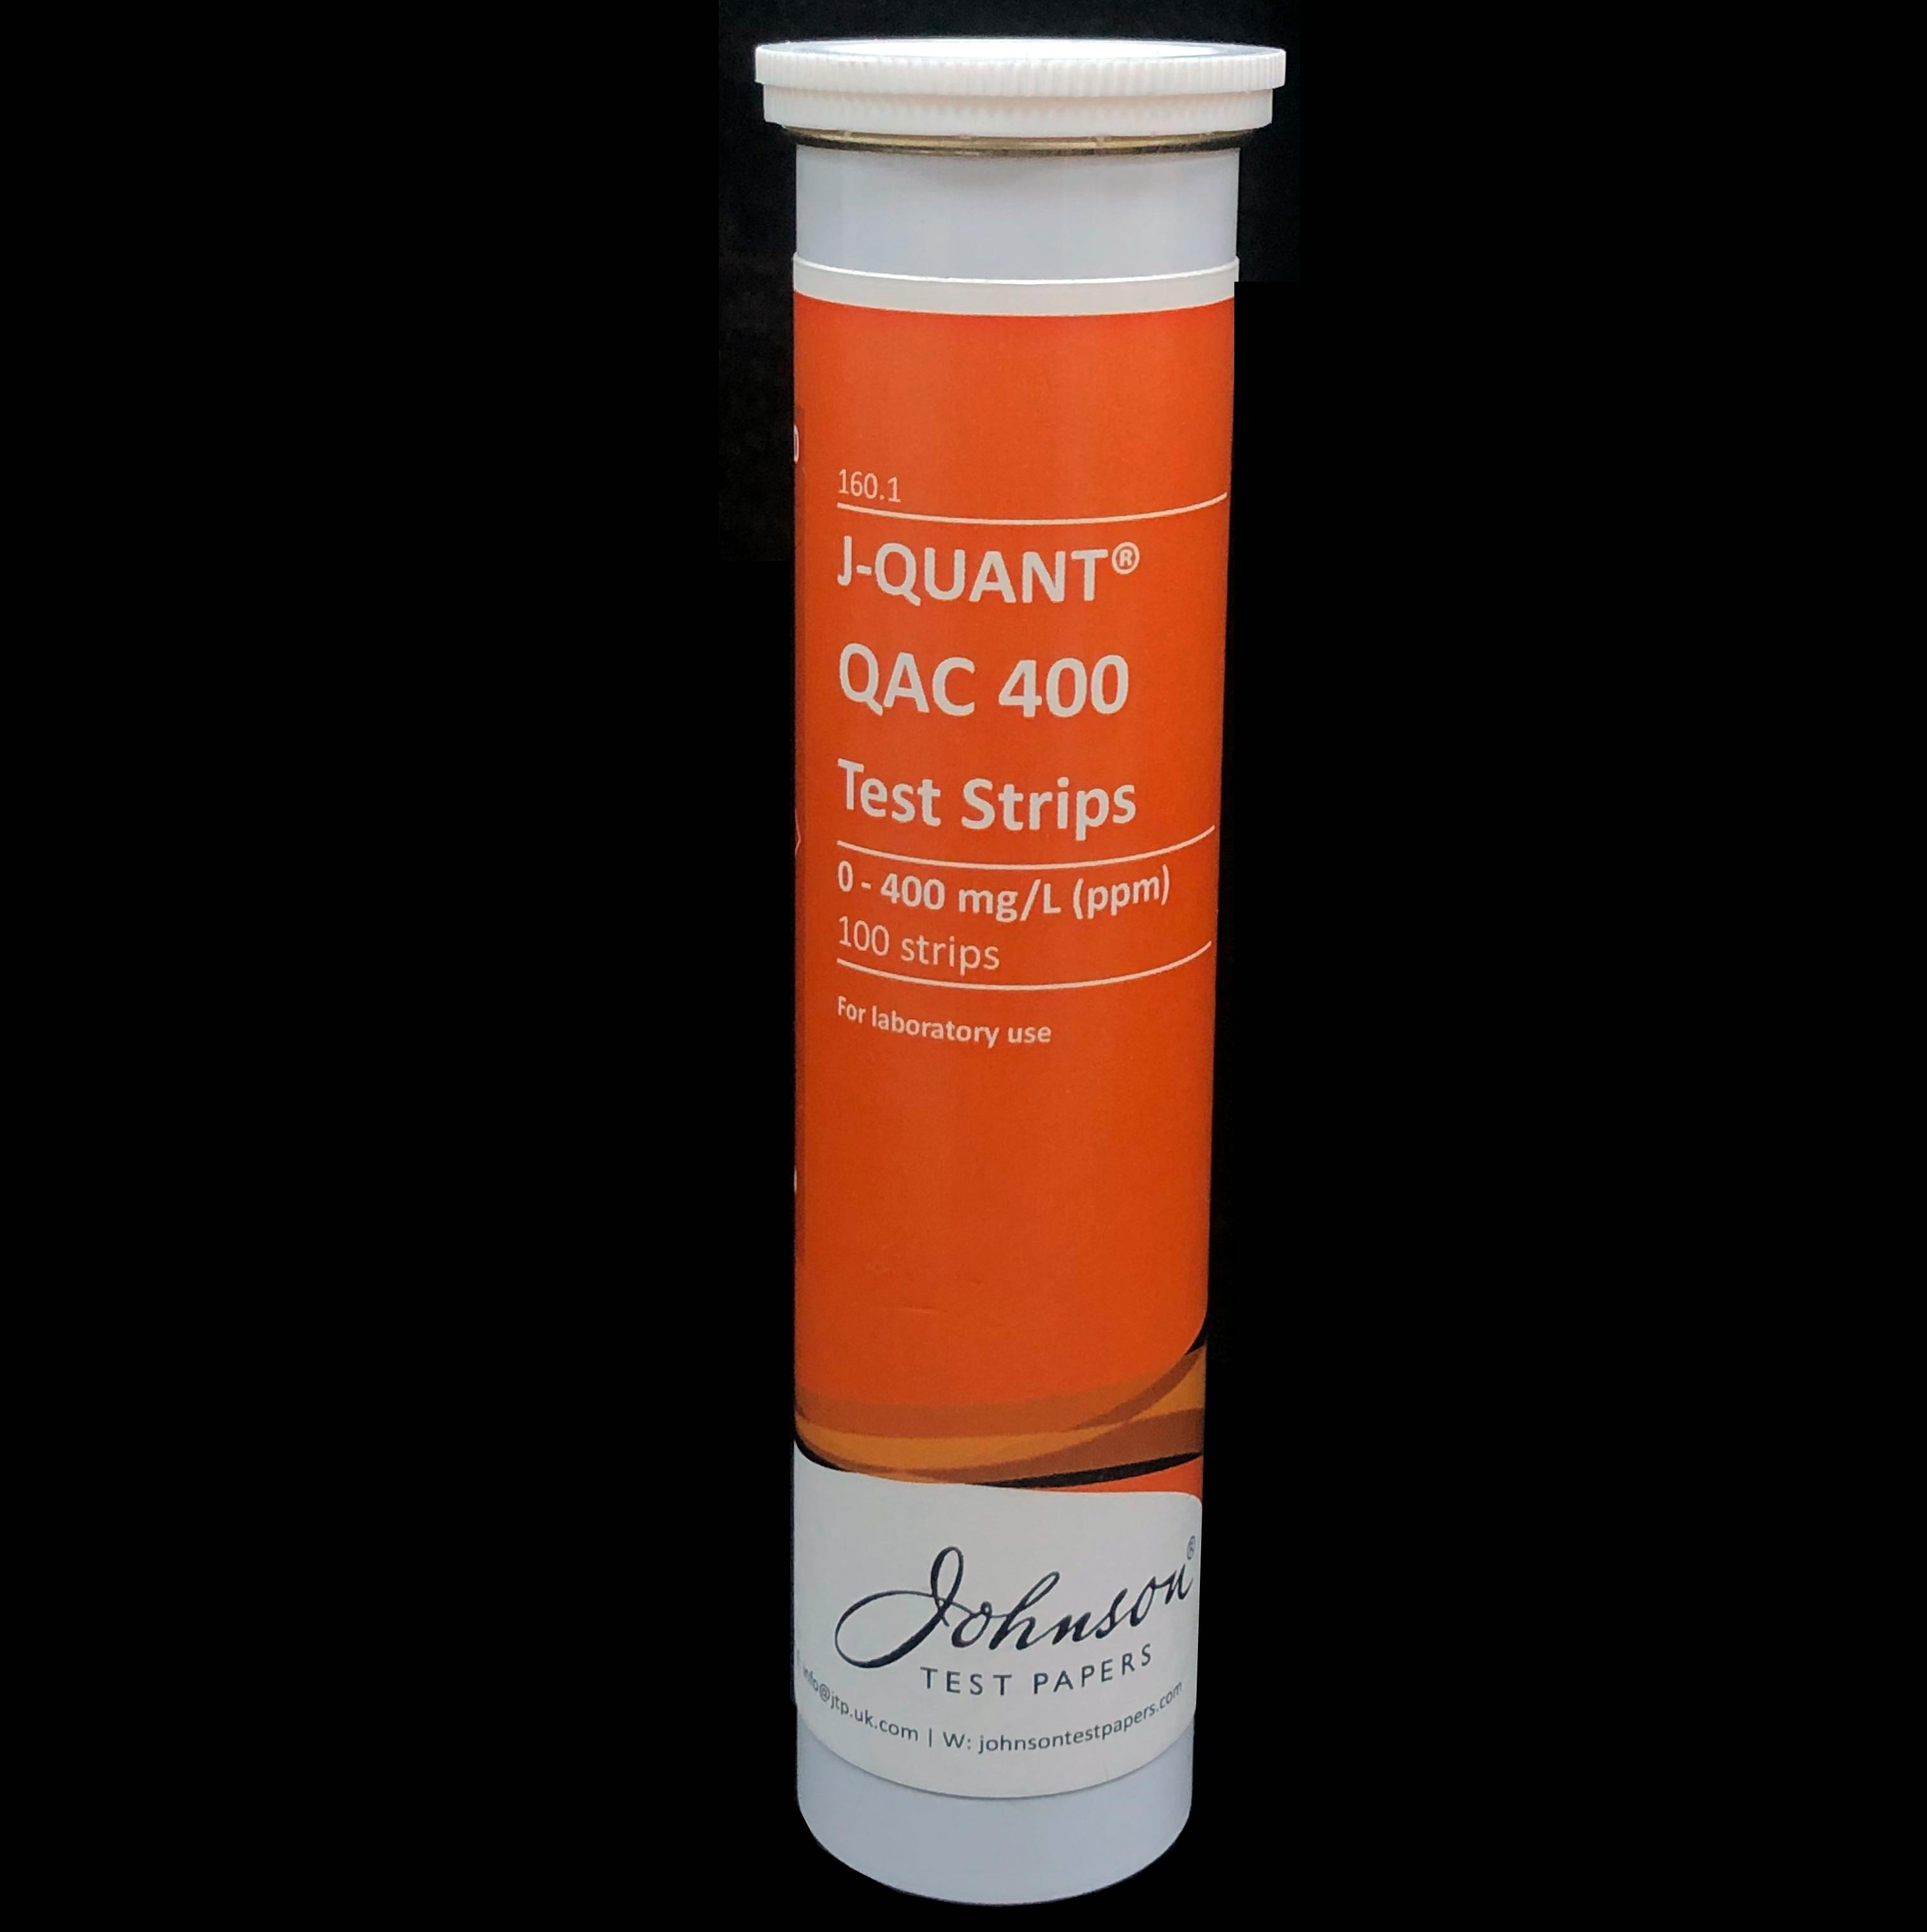 J-QUANT<sup>®</sup> QAC